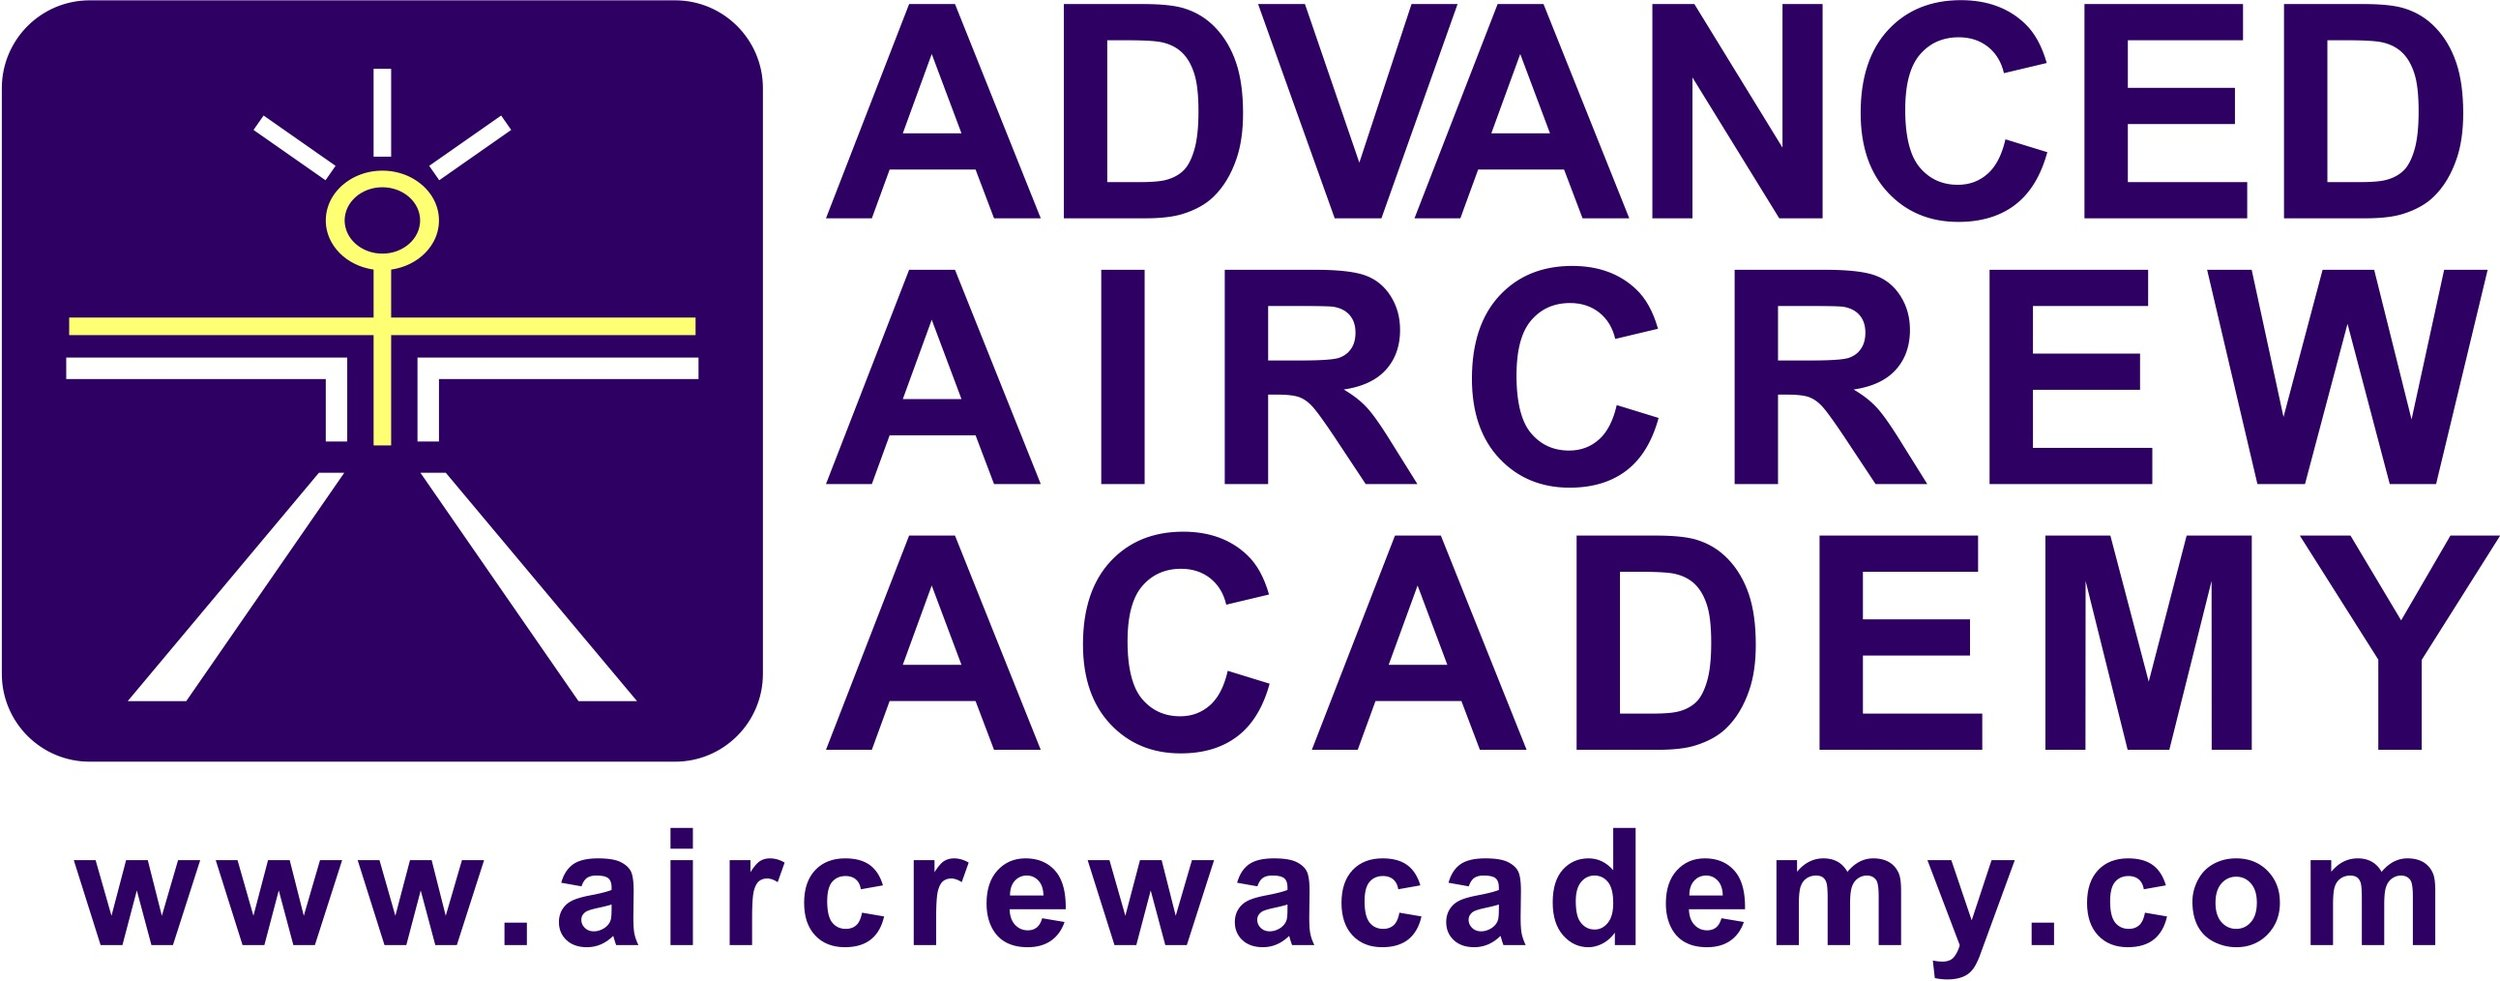 2 AircrewAcademy 2015 copy 2.jpg